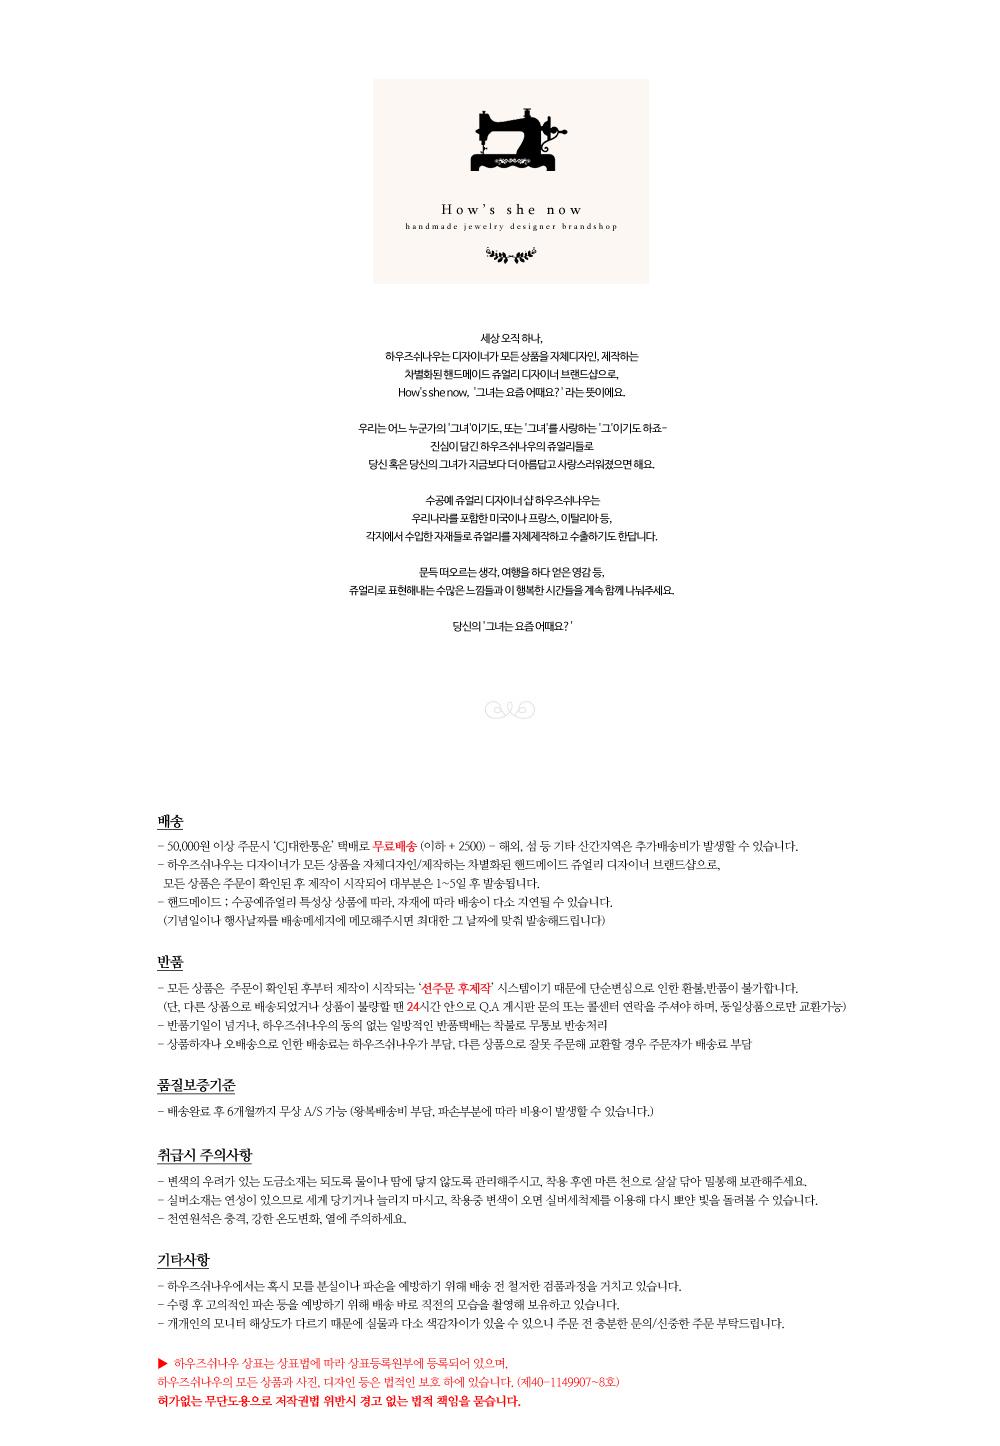 The Course of Love- Silver Simple Ring (심플링) - 하우즈쉬나우, 12,000원, 실버, 실반지